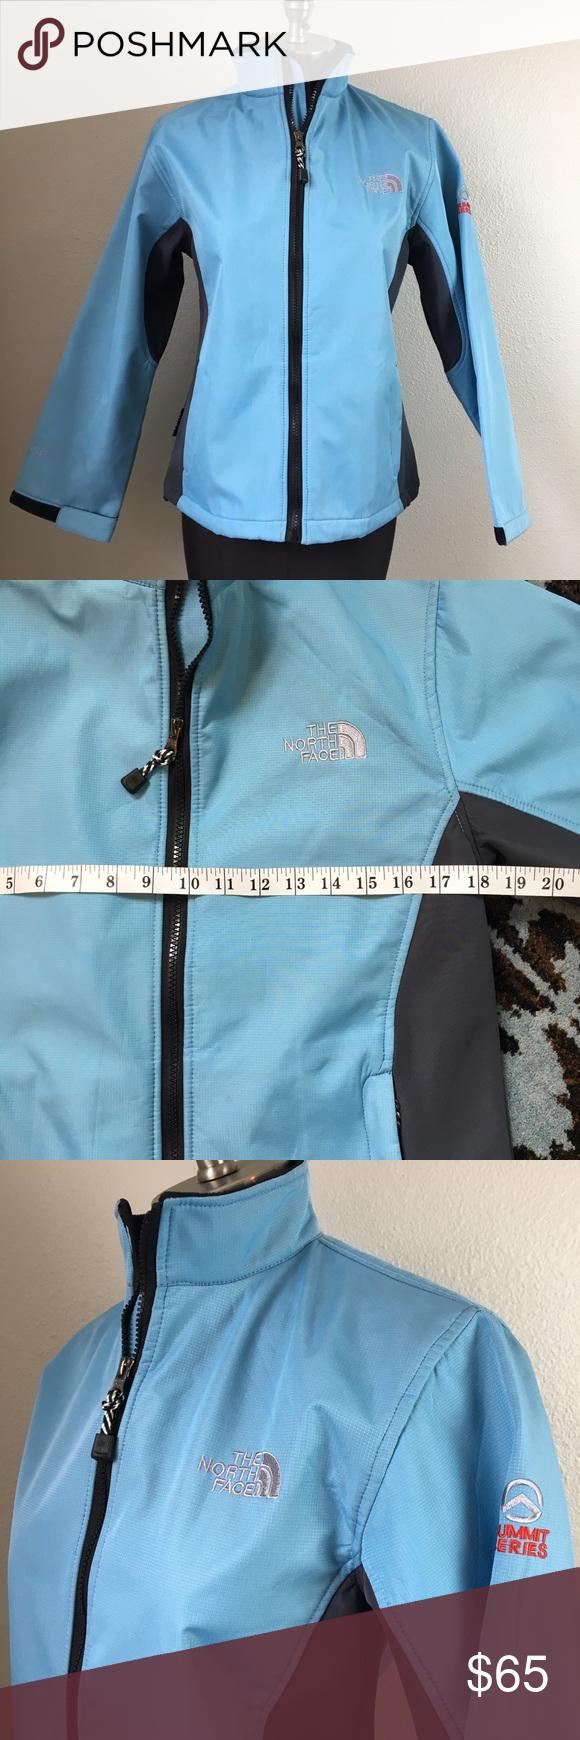 North Face Summit Series 3x Dry Women S Jacket Clothes Design Fashion Design Fashion [ 1740 x 580 Pixel ]